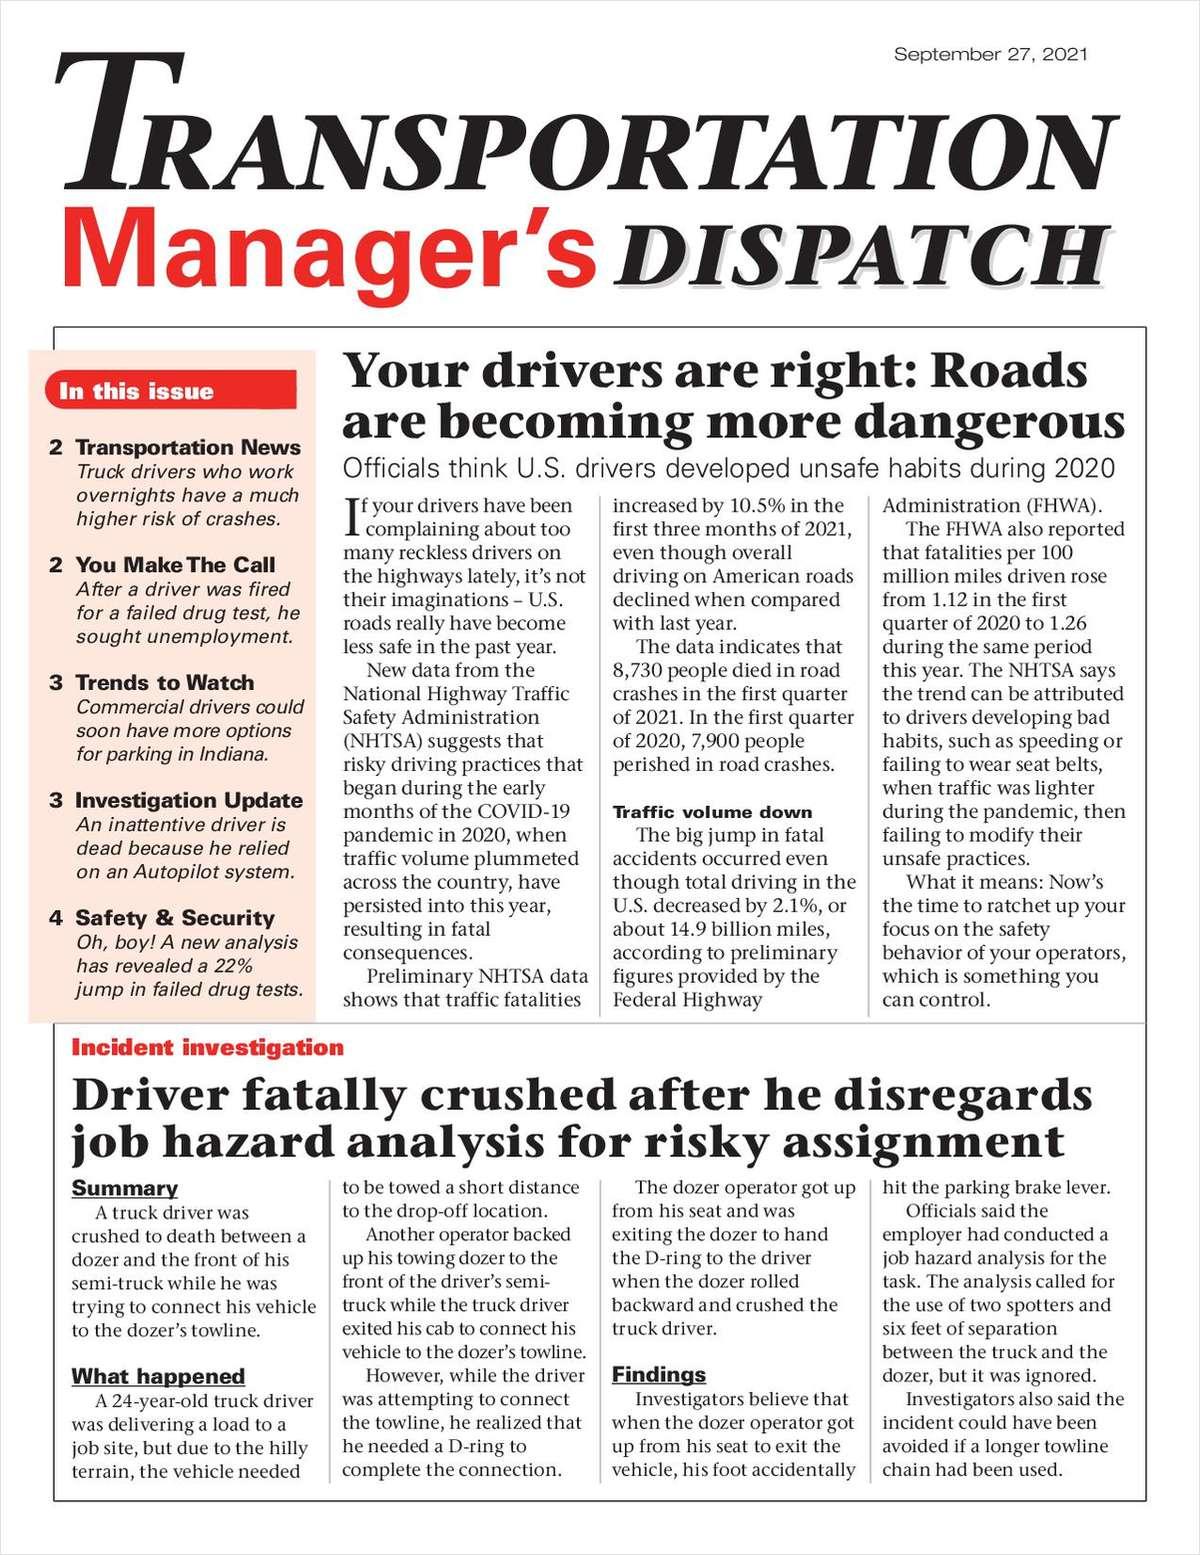 Transportation Manager's Dispatch Newsletter: September 27 Issue